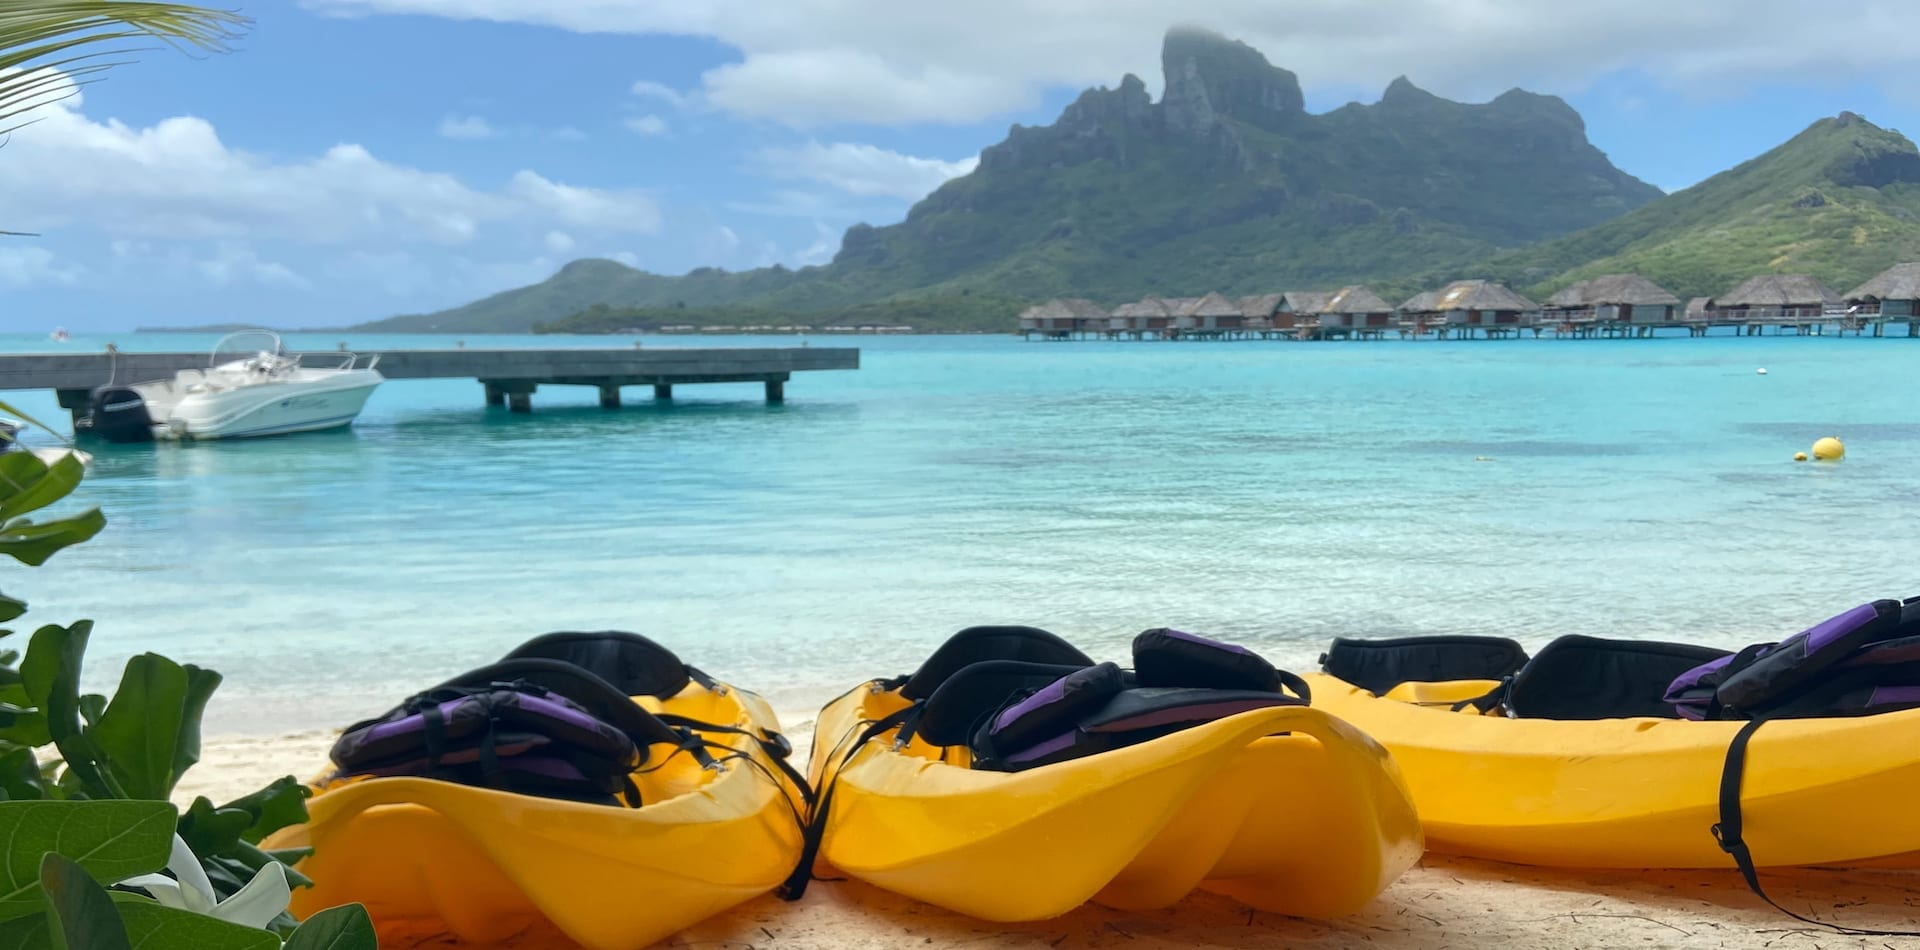 Kayaks on a Beach in Tahiti